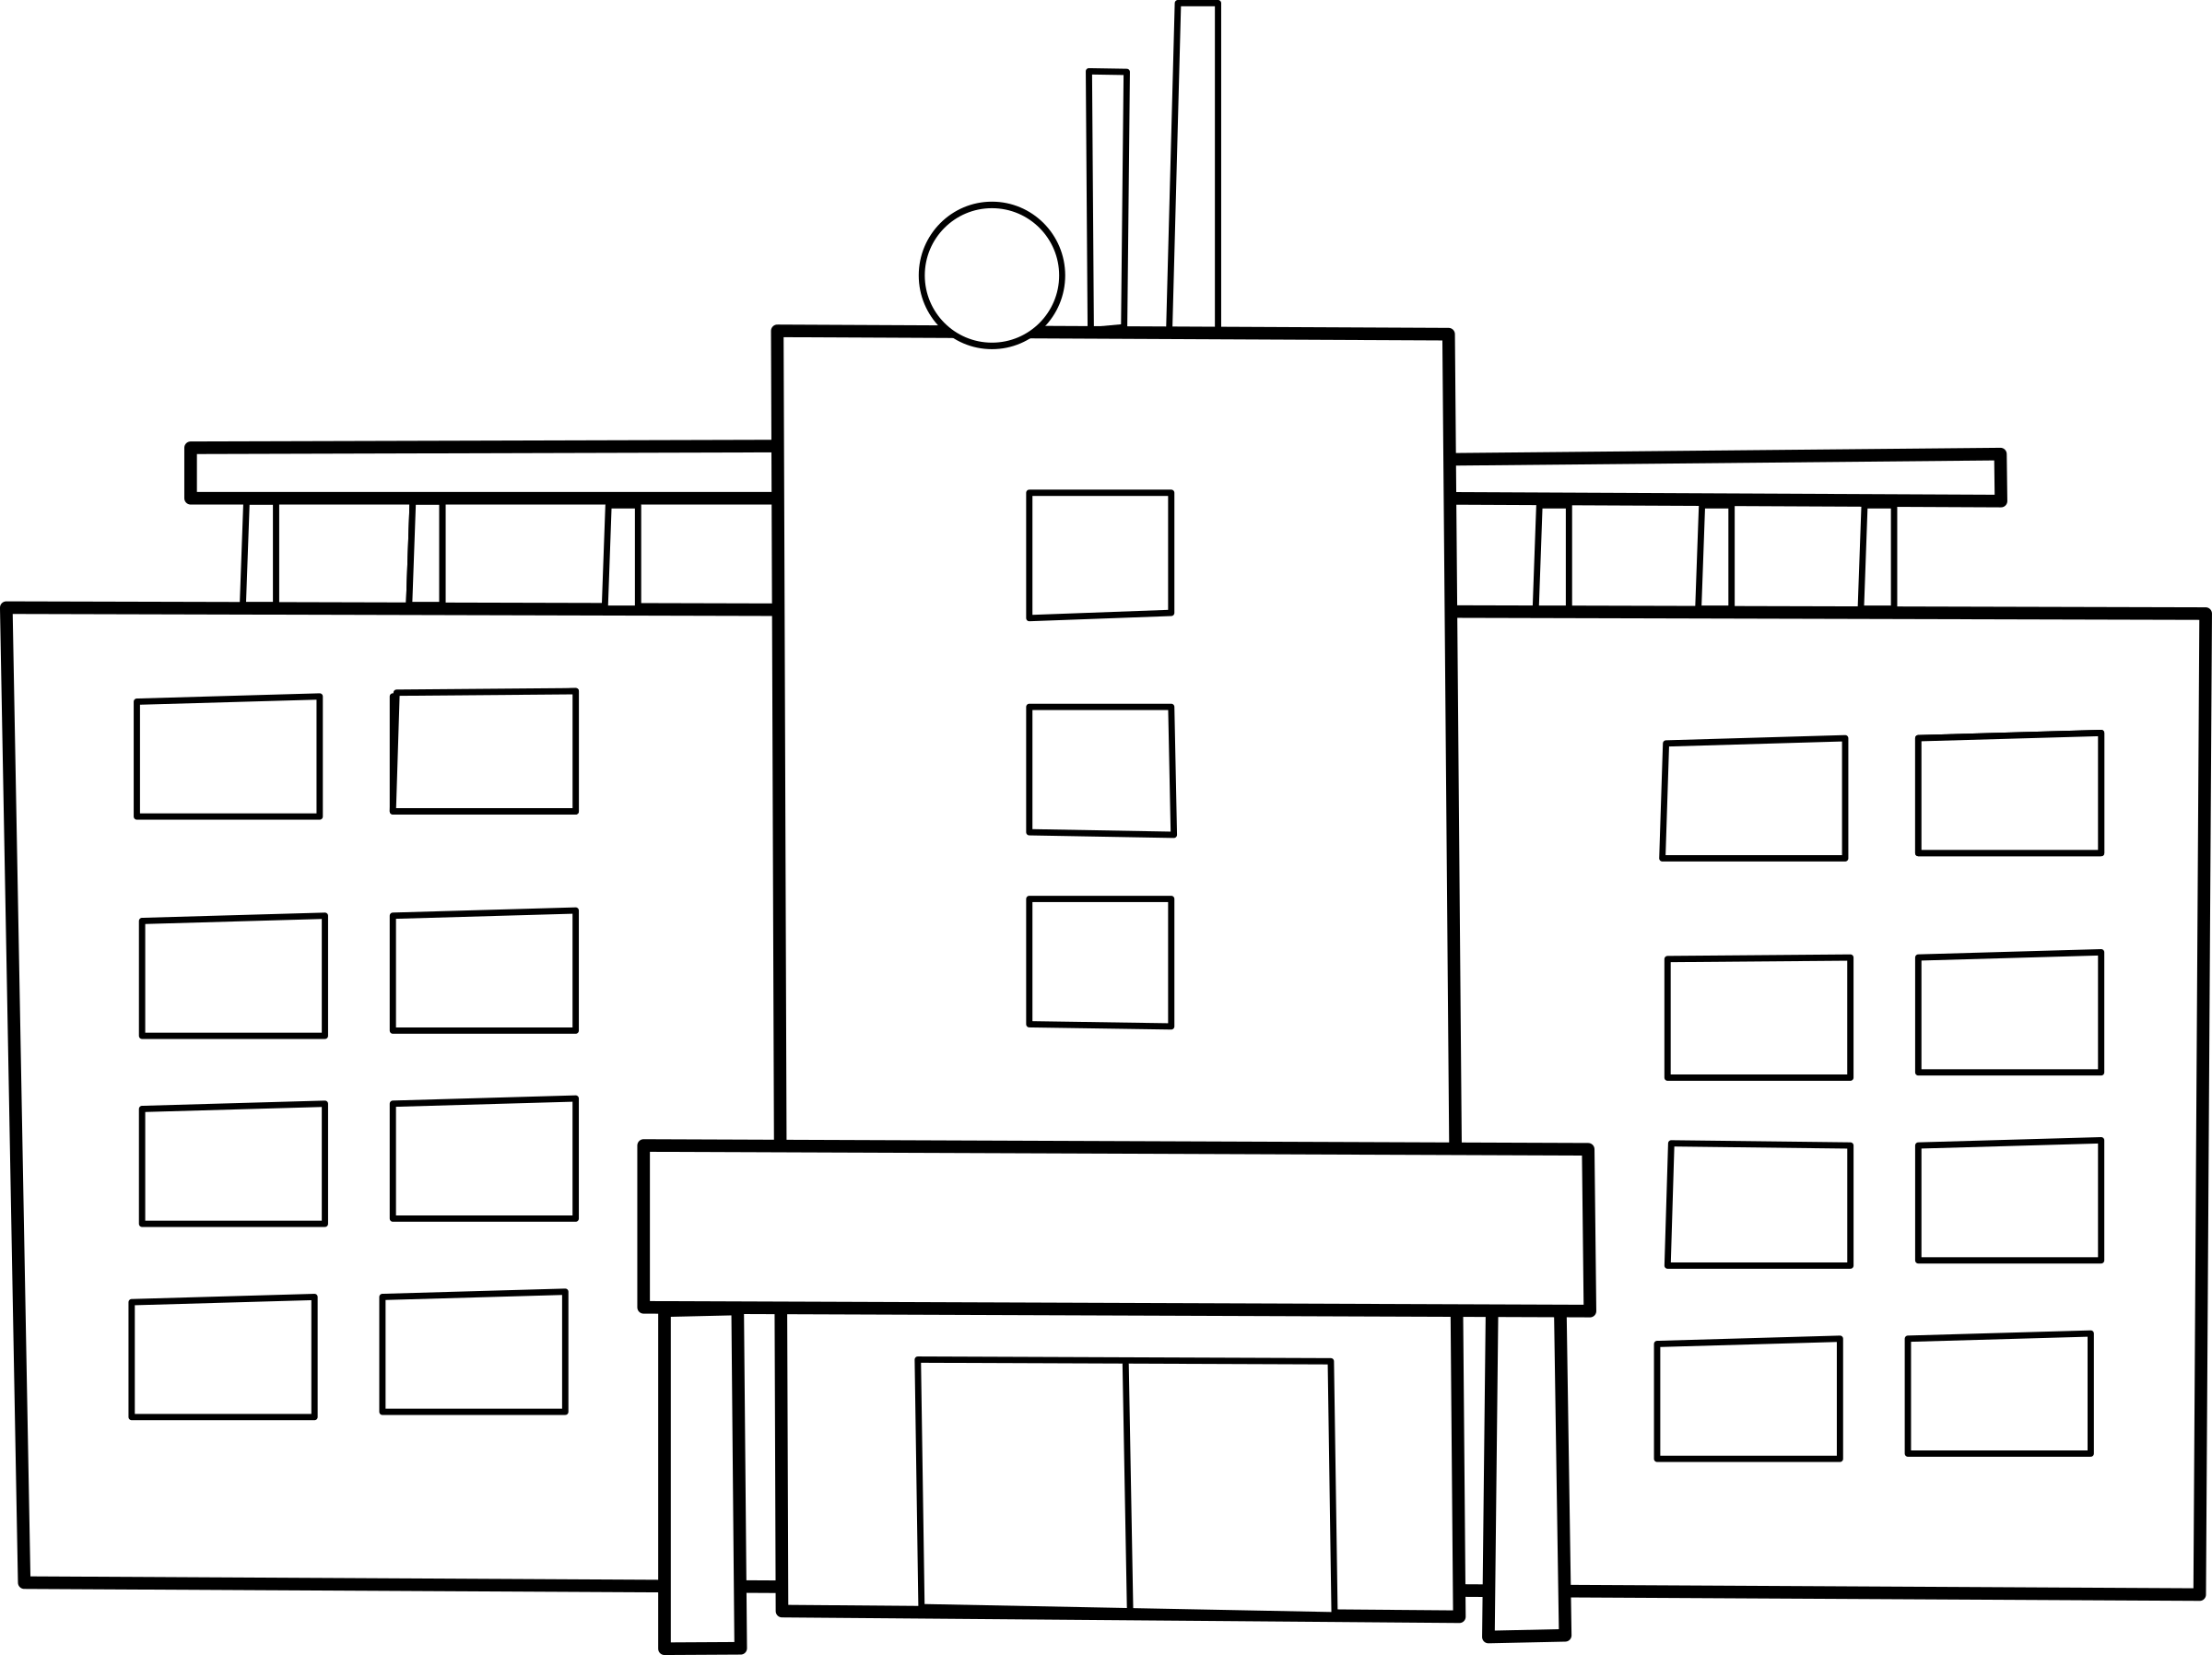 Hopital big image png. Hospital clipart black and white